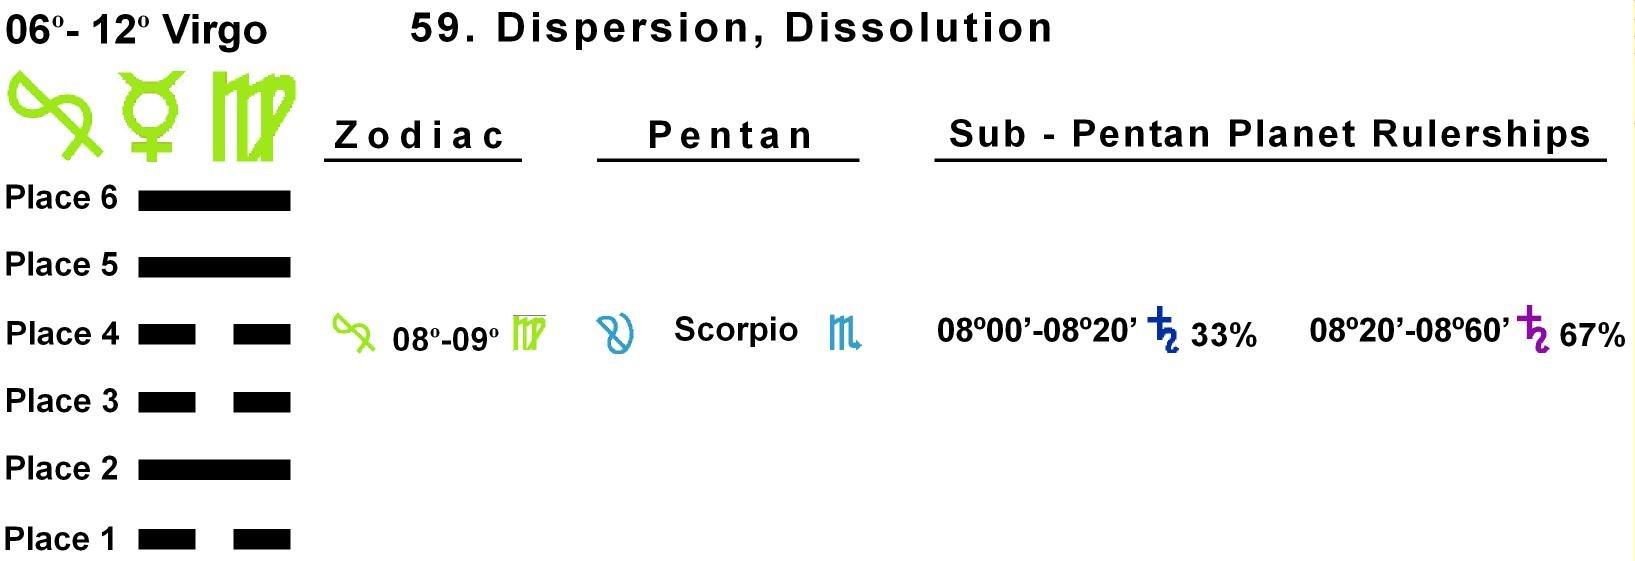 Pent-lines-06VI 08-09 Hx-59 Dispersion